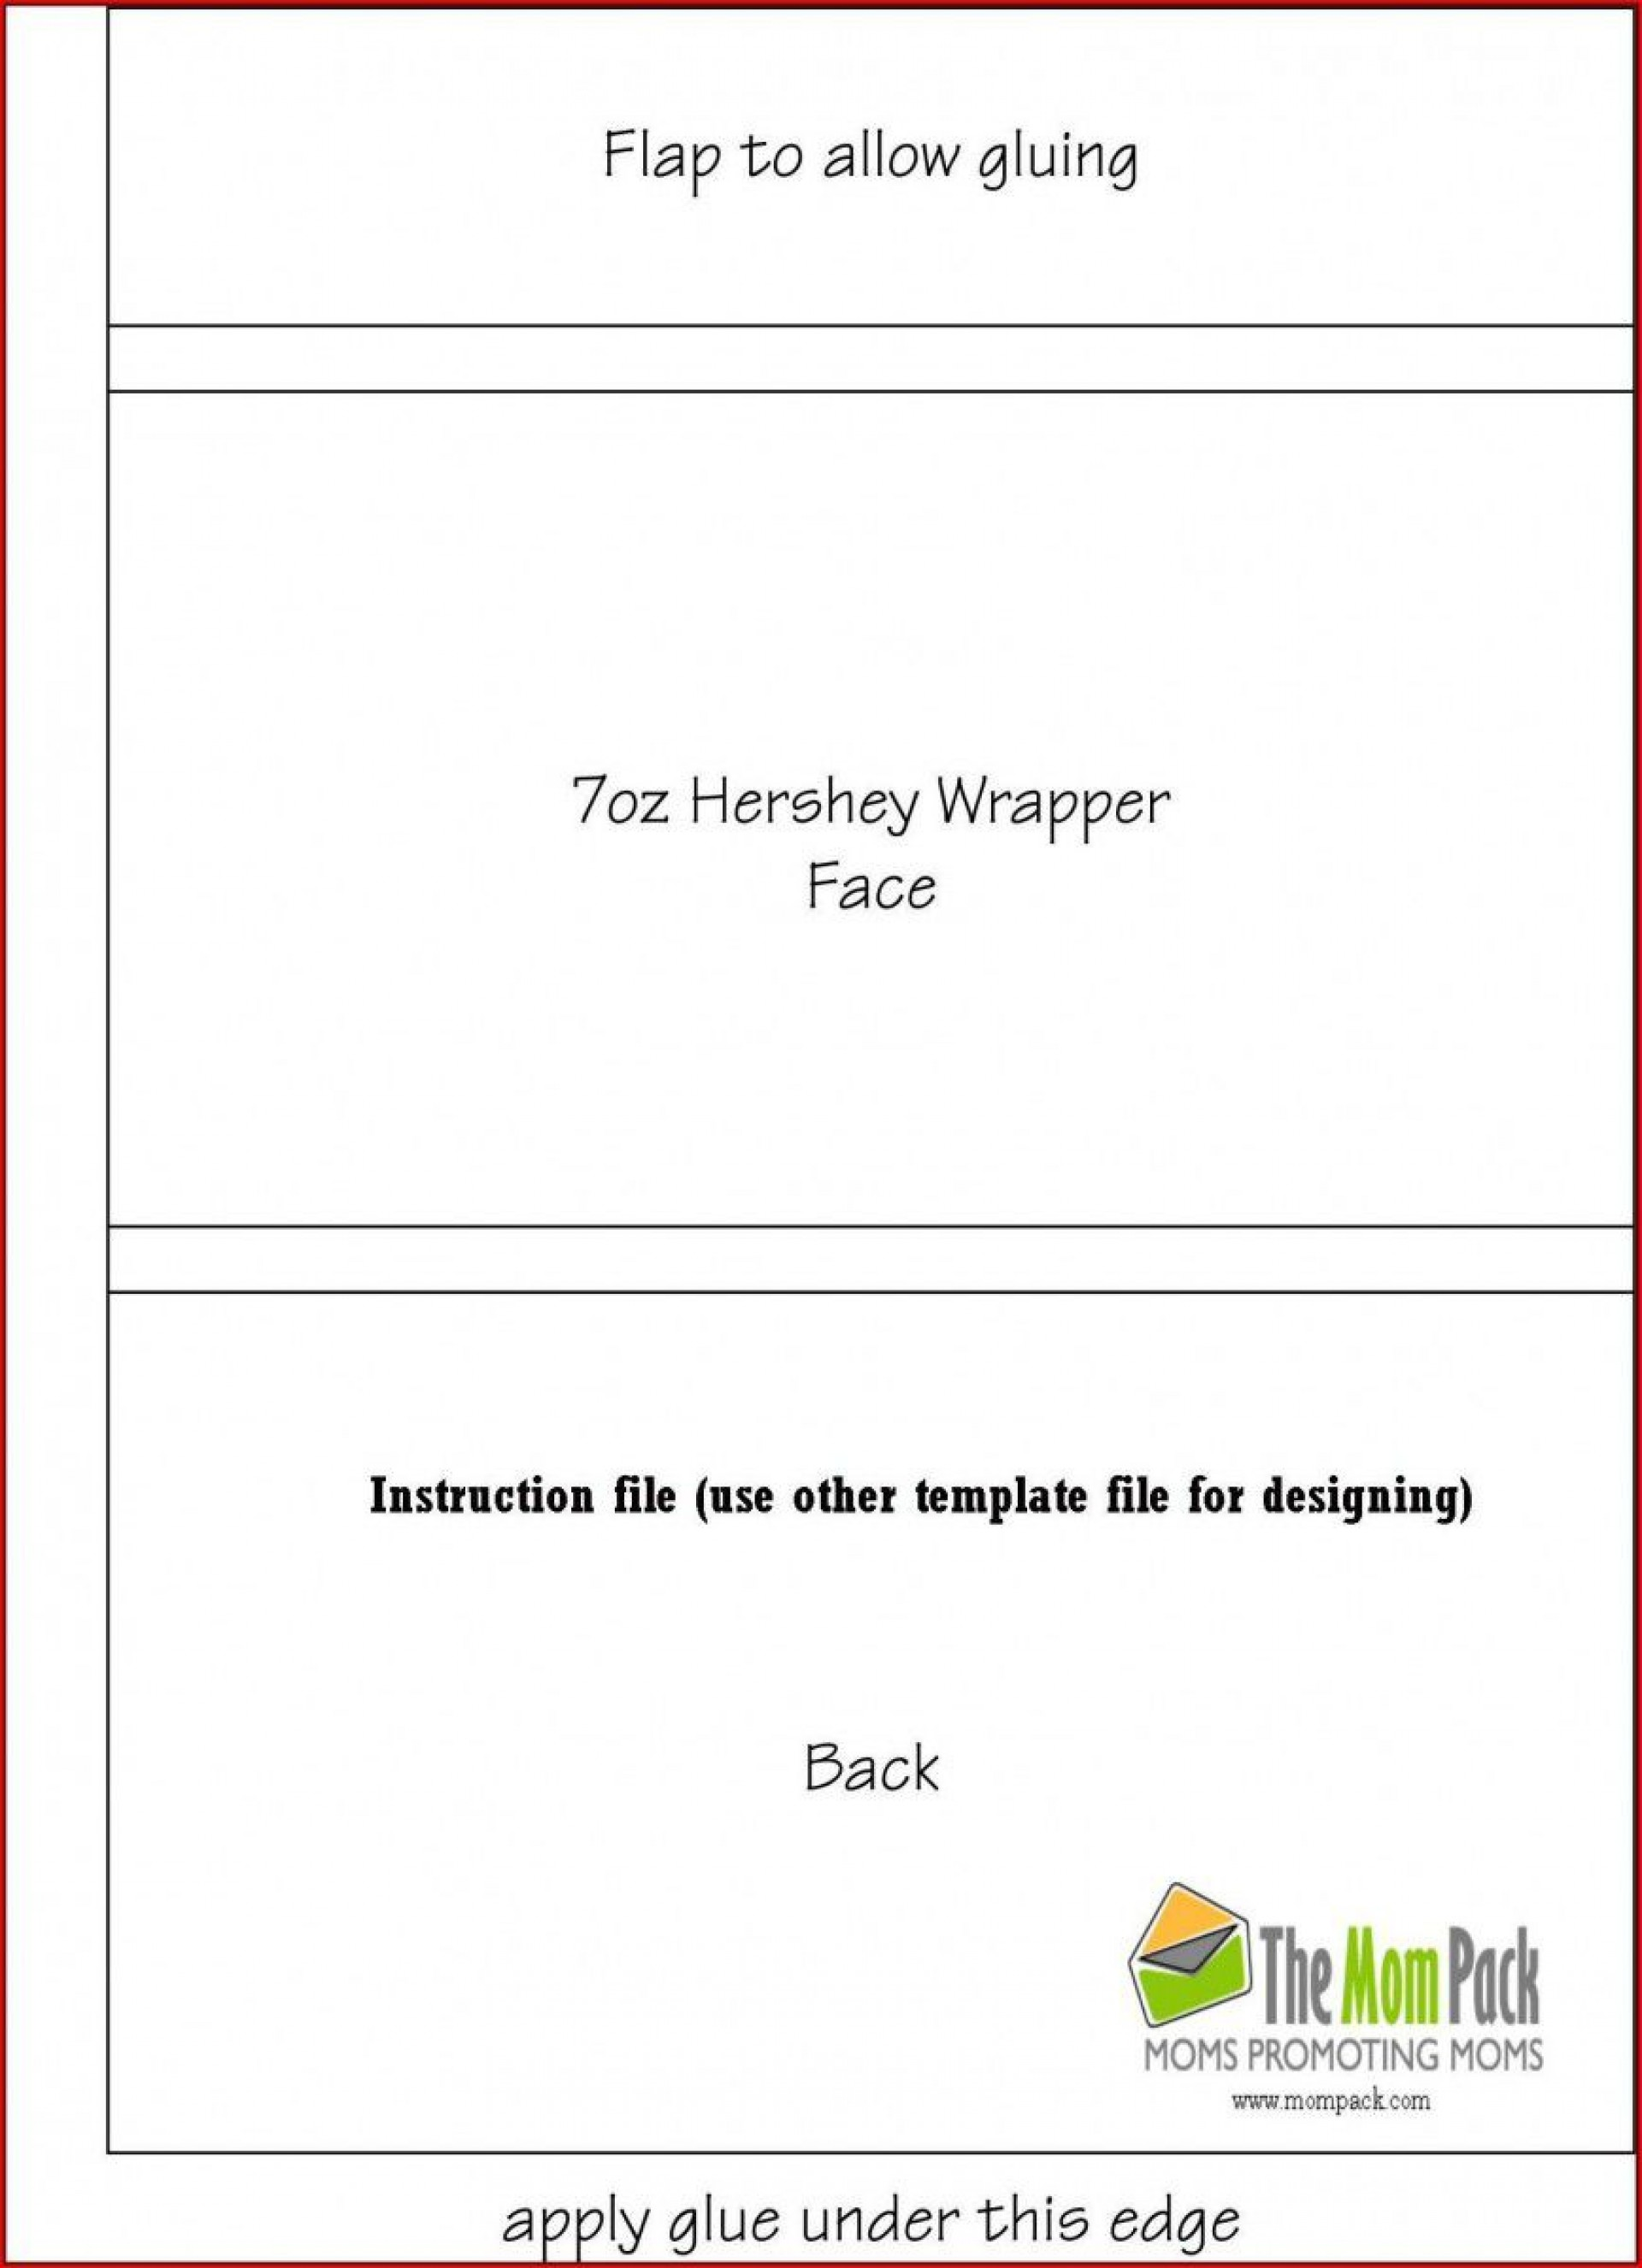 003 Singular Free Chocolate Bar Wrapper Template Word Idea  For1920